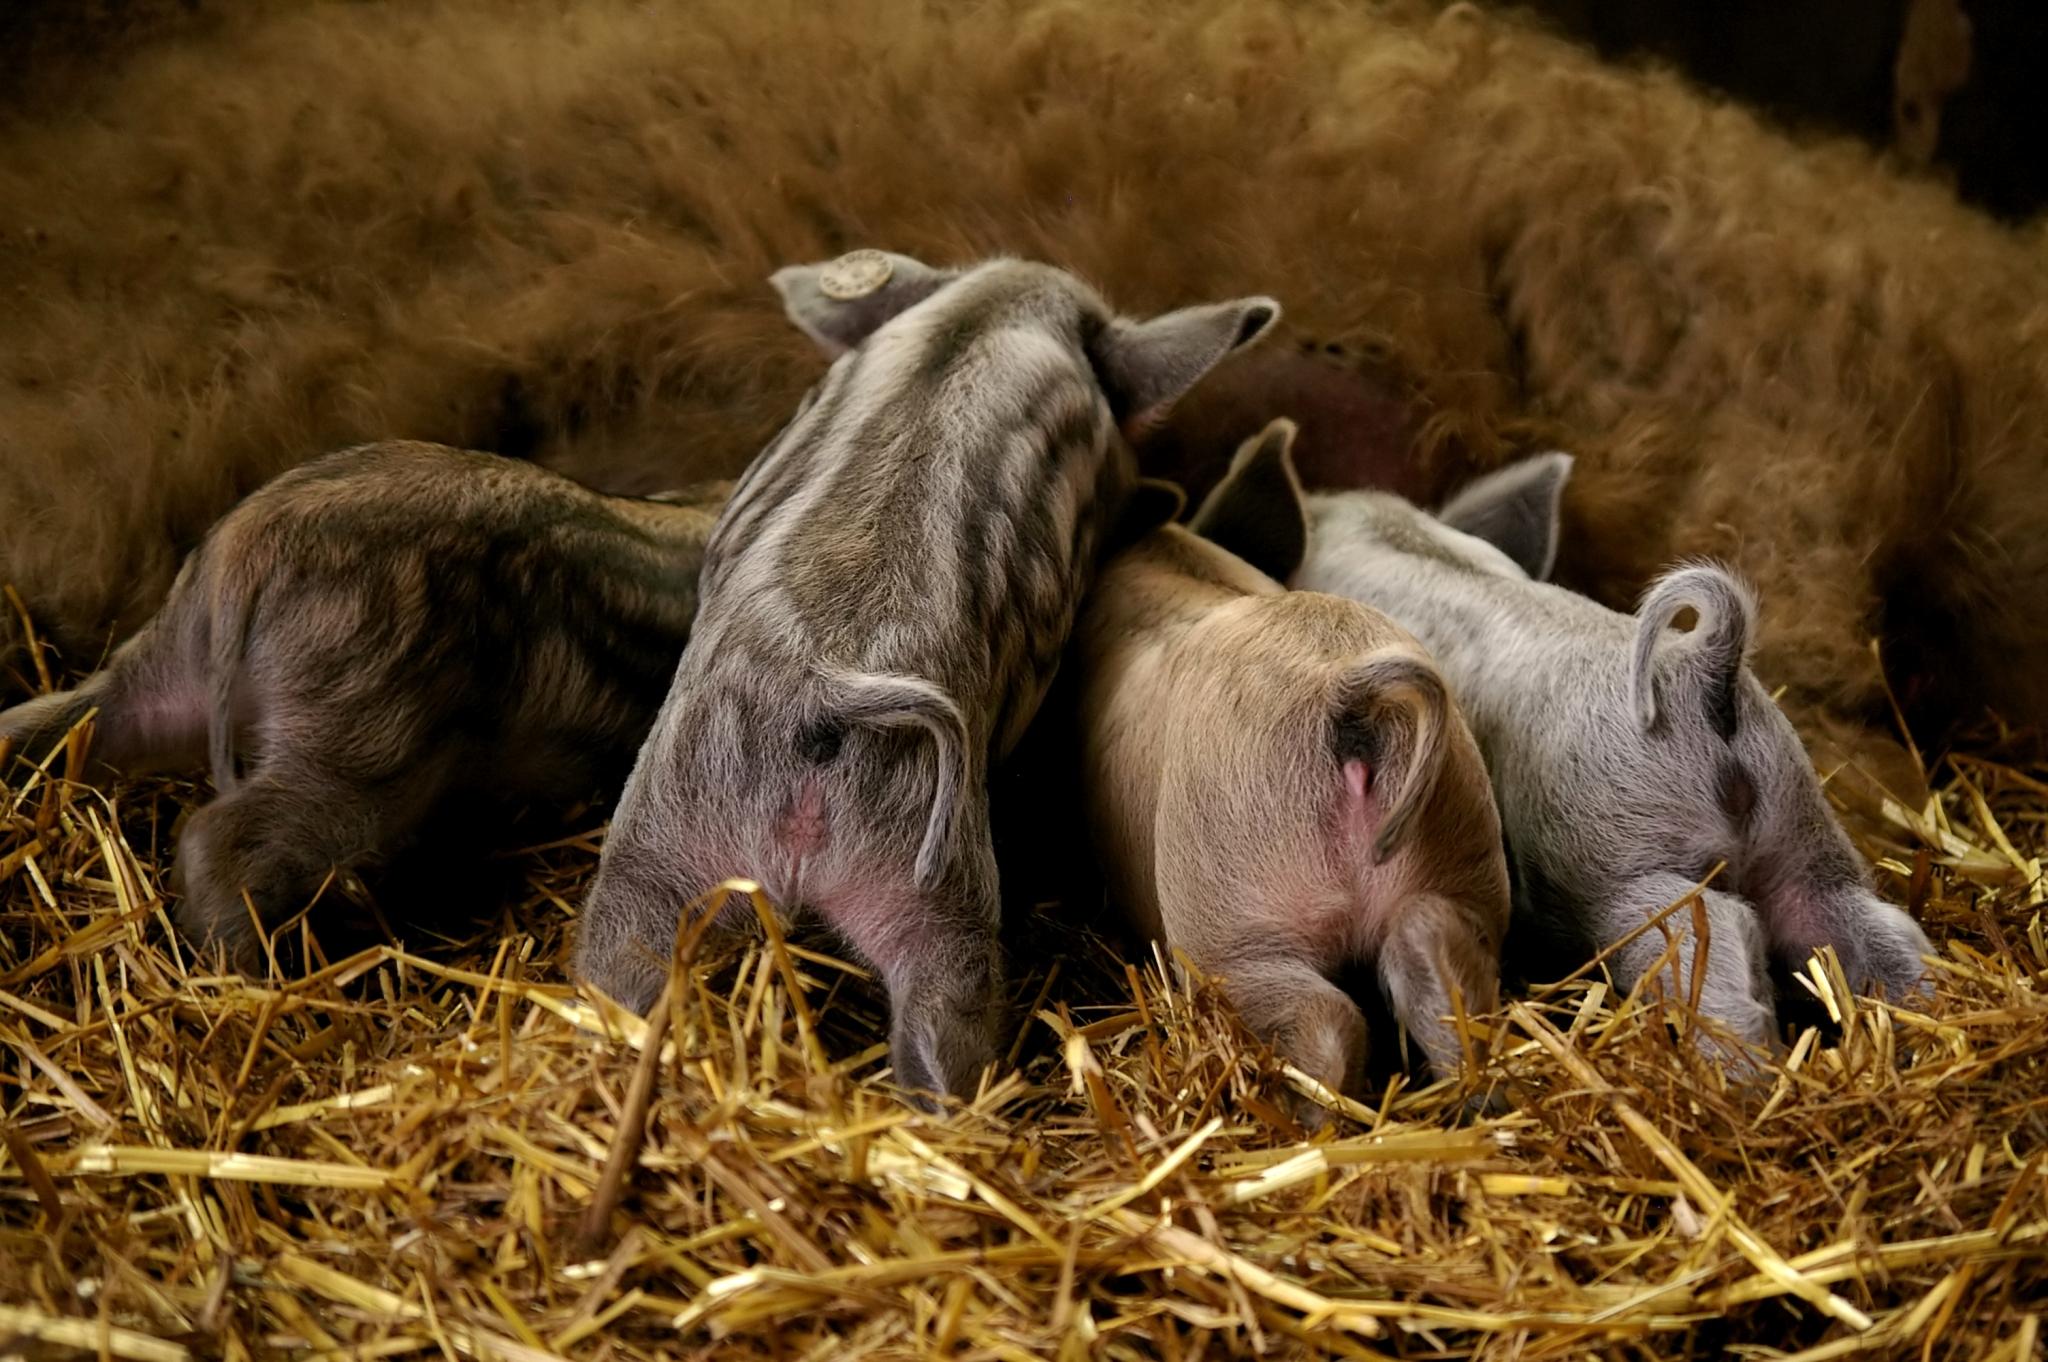 Piglets of Mangalitza pig